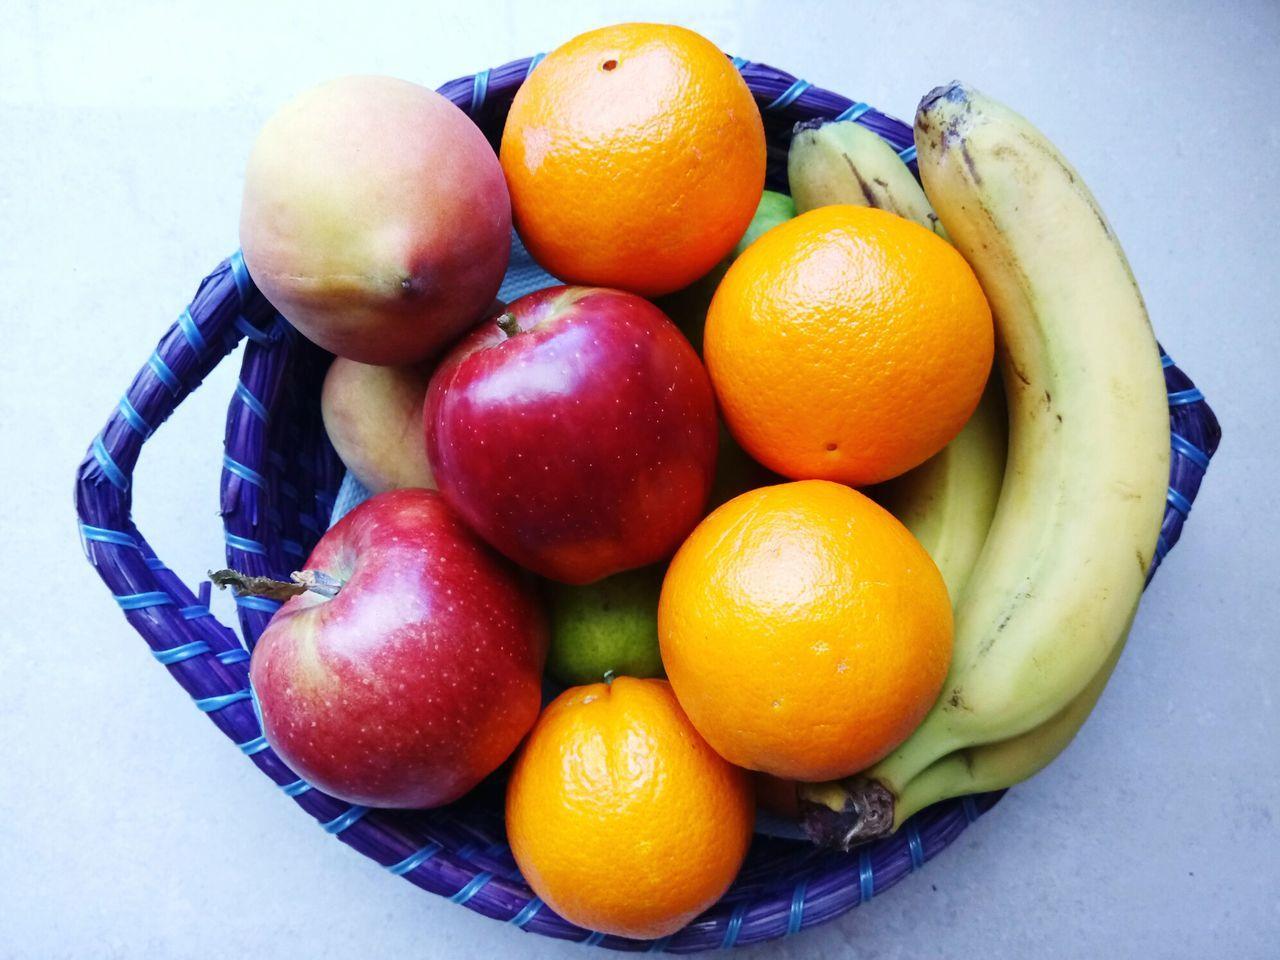 Healthy Eating Fruit Food No People Freshness Food And Drink Close-up Bowl Nature Healthy Fresh EyeEm Nature Lover EyeEm Gallery Banana Apple Orange Vitamins